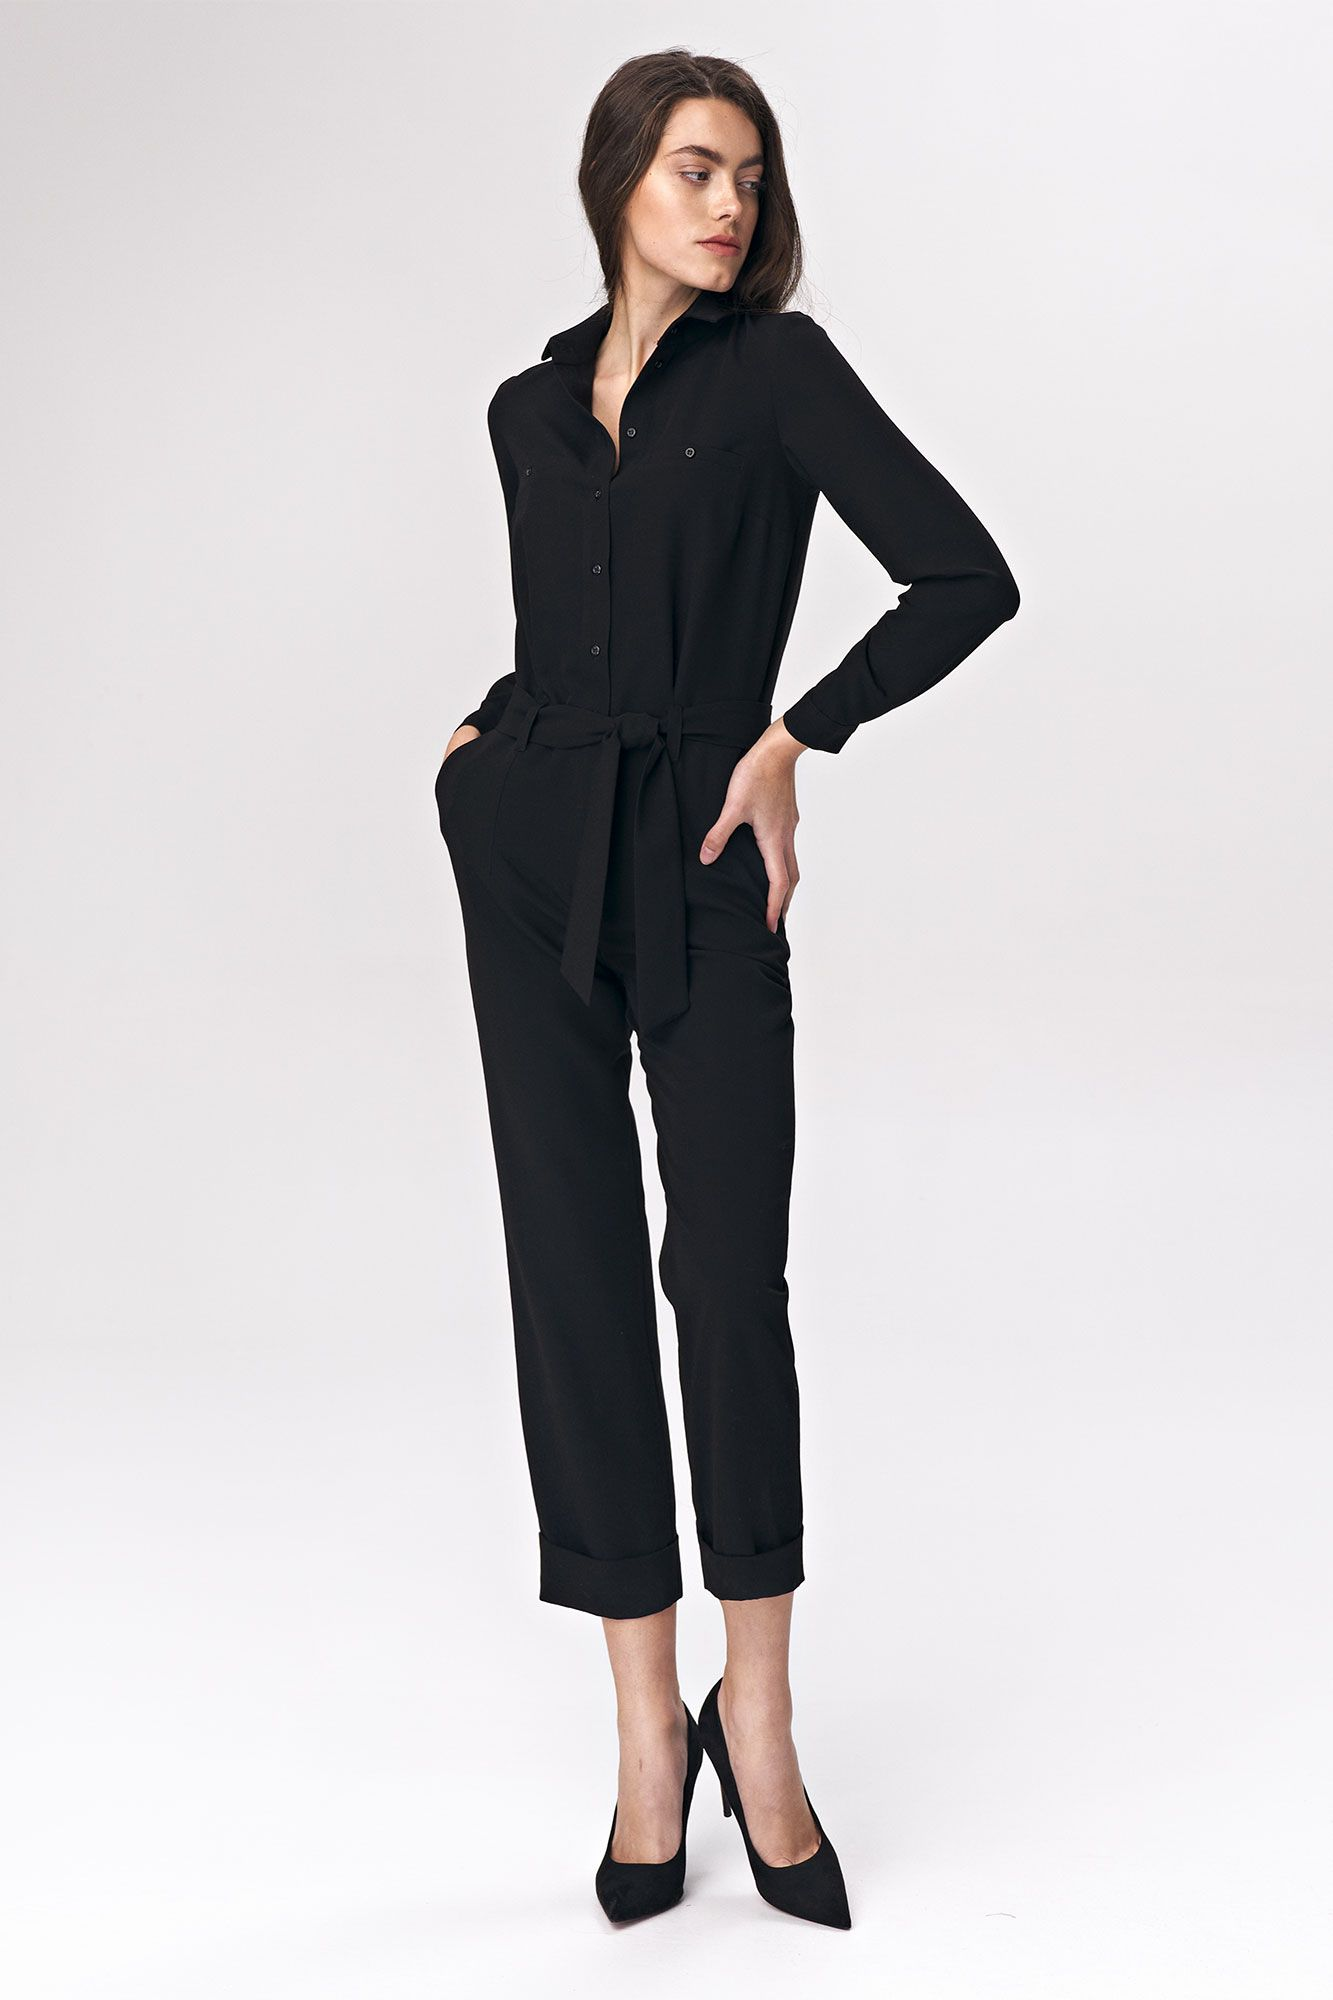 Black jumpsuit with tie